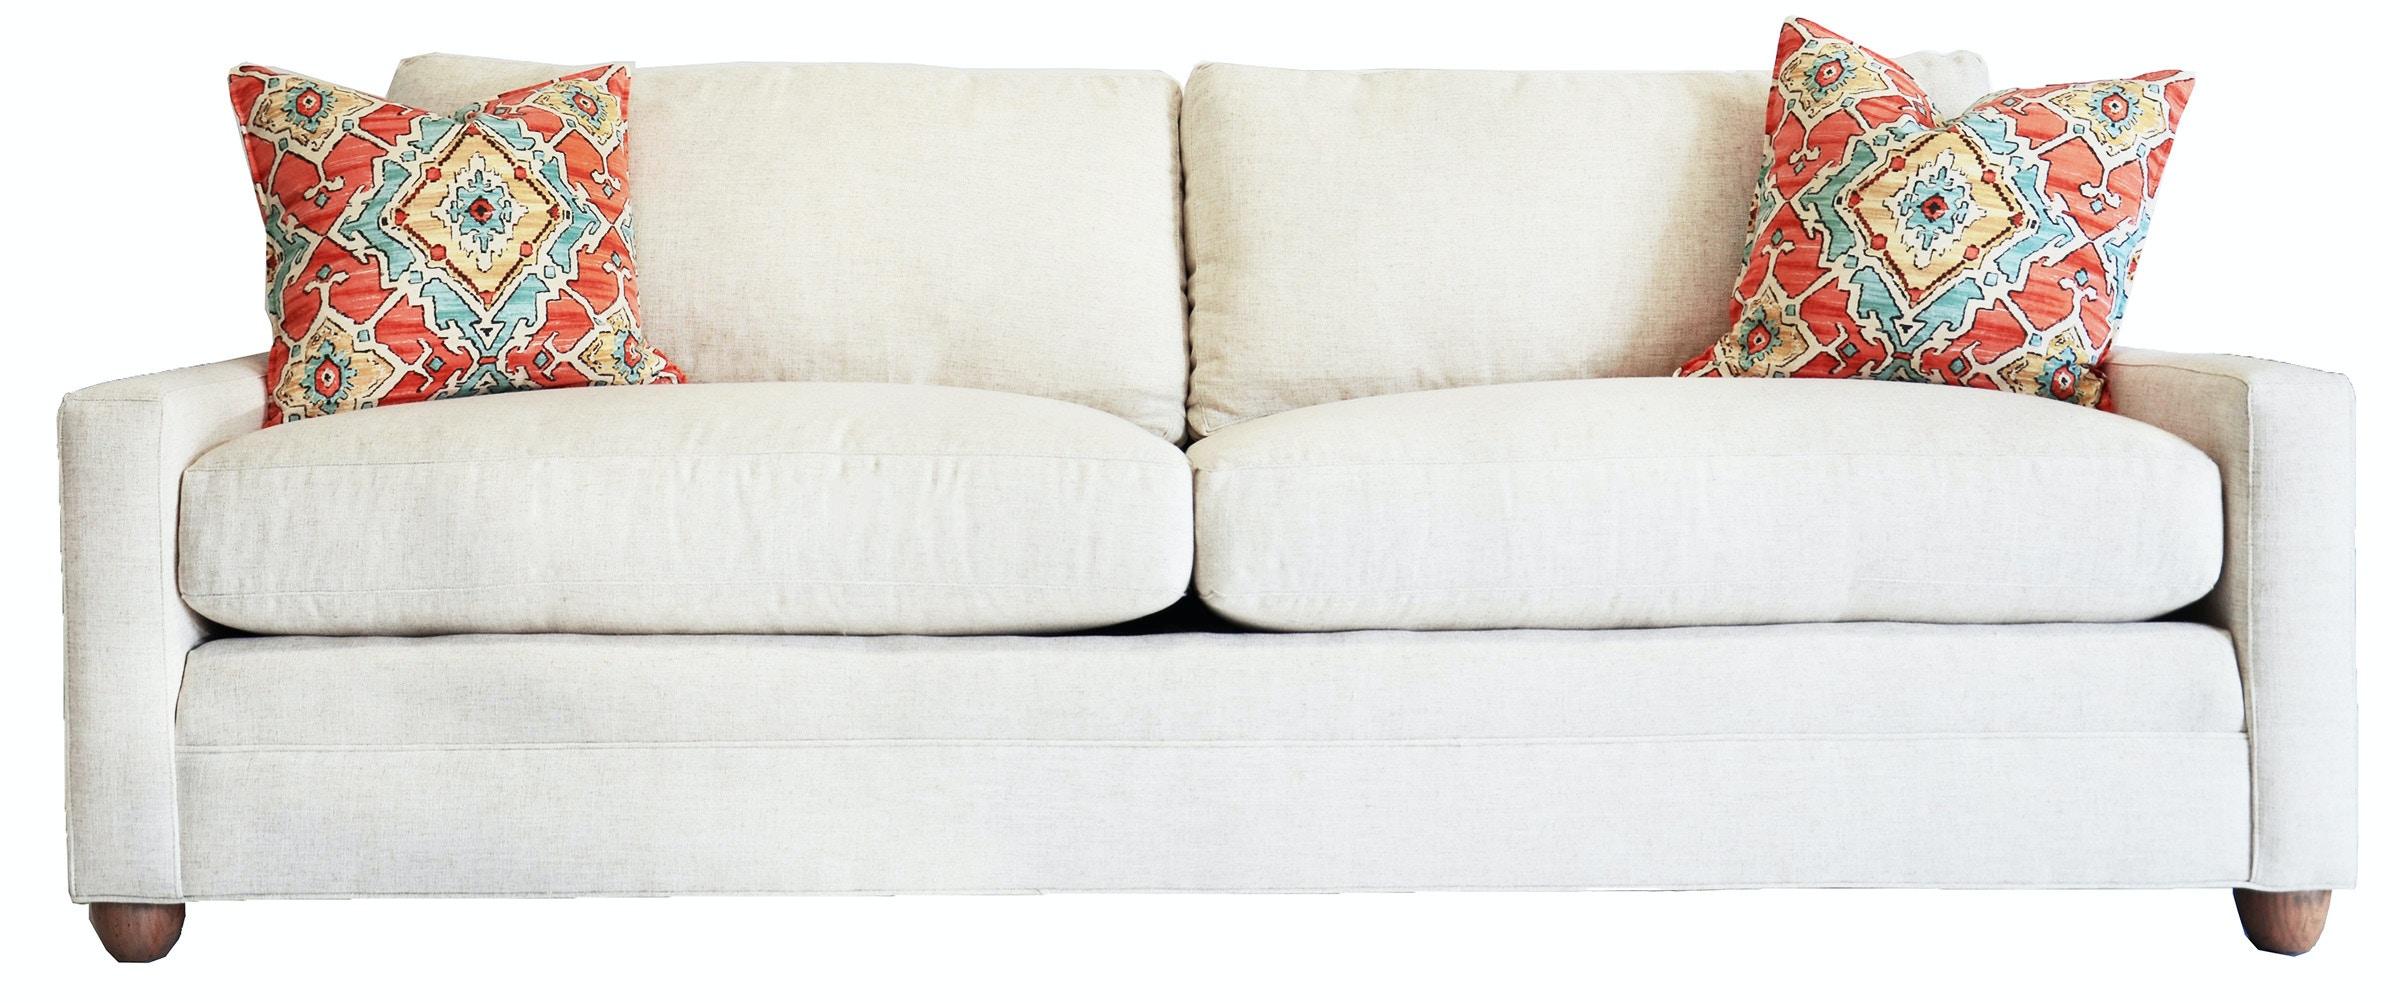 ... Stacy Furniture Grapevine By Vanguard Living Room Fairgrove Sleep Sofa  652 2ss Stacy ...